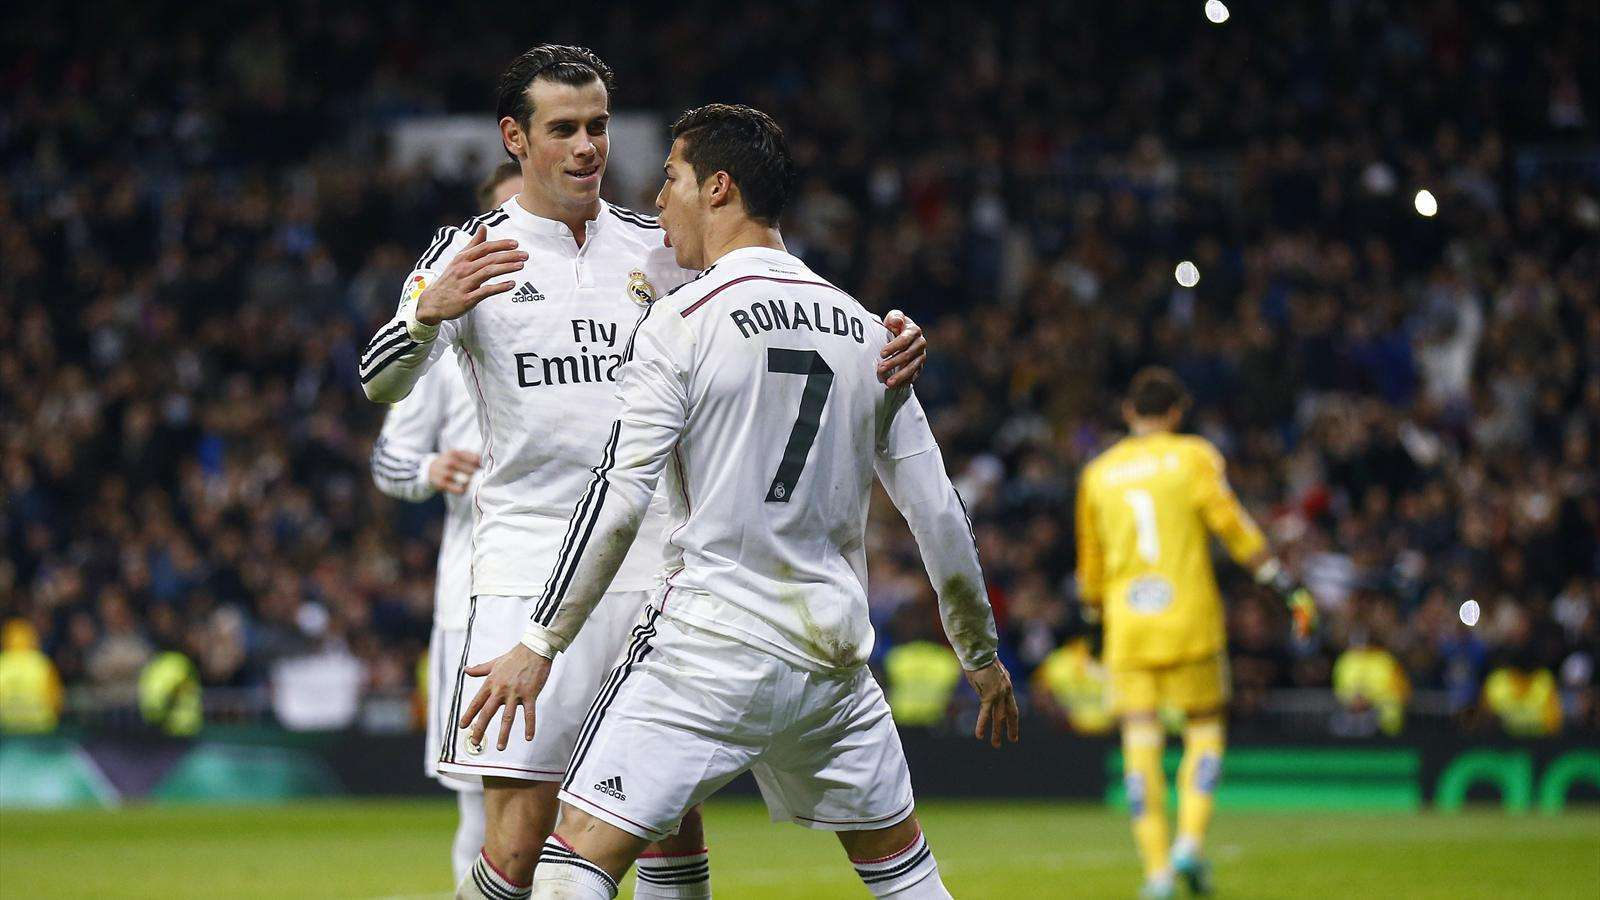 Gareth Bale Hd Images